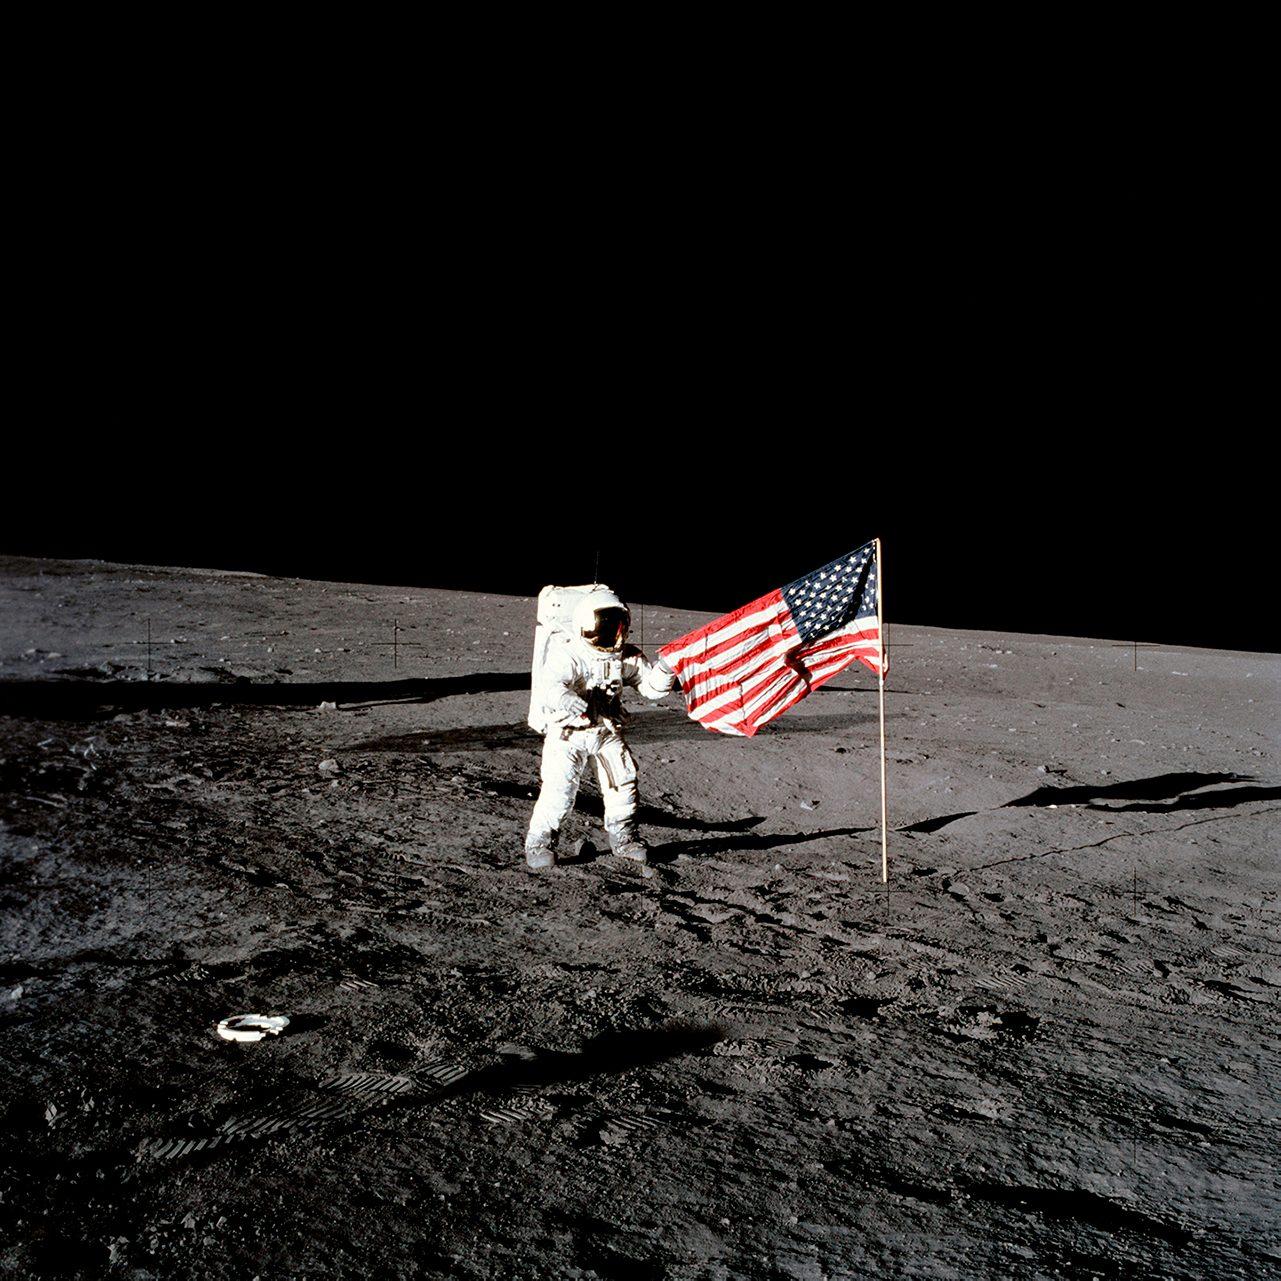 Person, Human, Astronaut